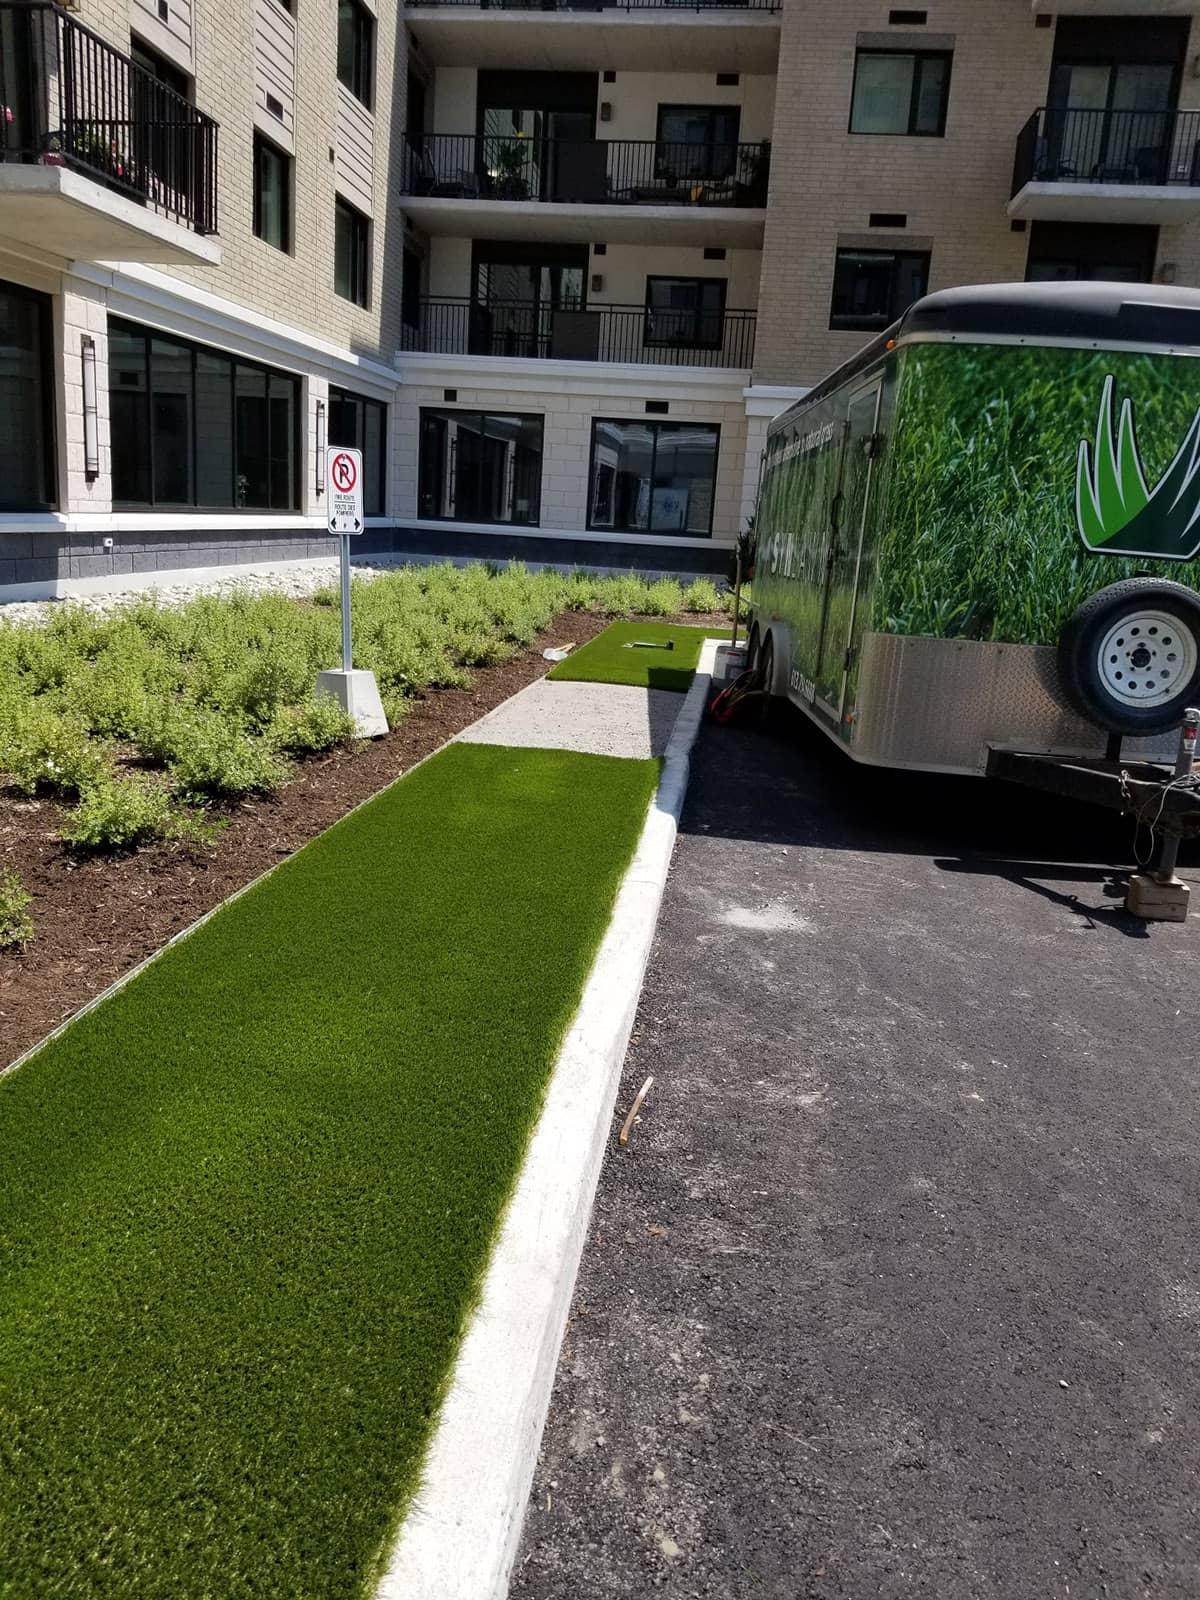 Plant beds and artificial turf at Les Terasses Francesca Apartment Community